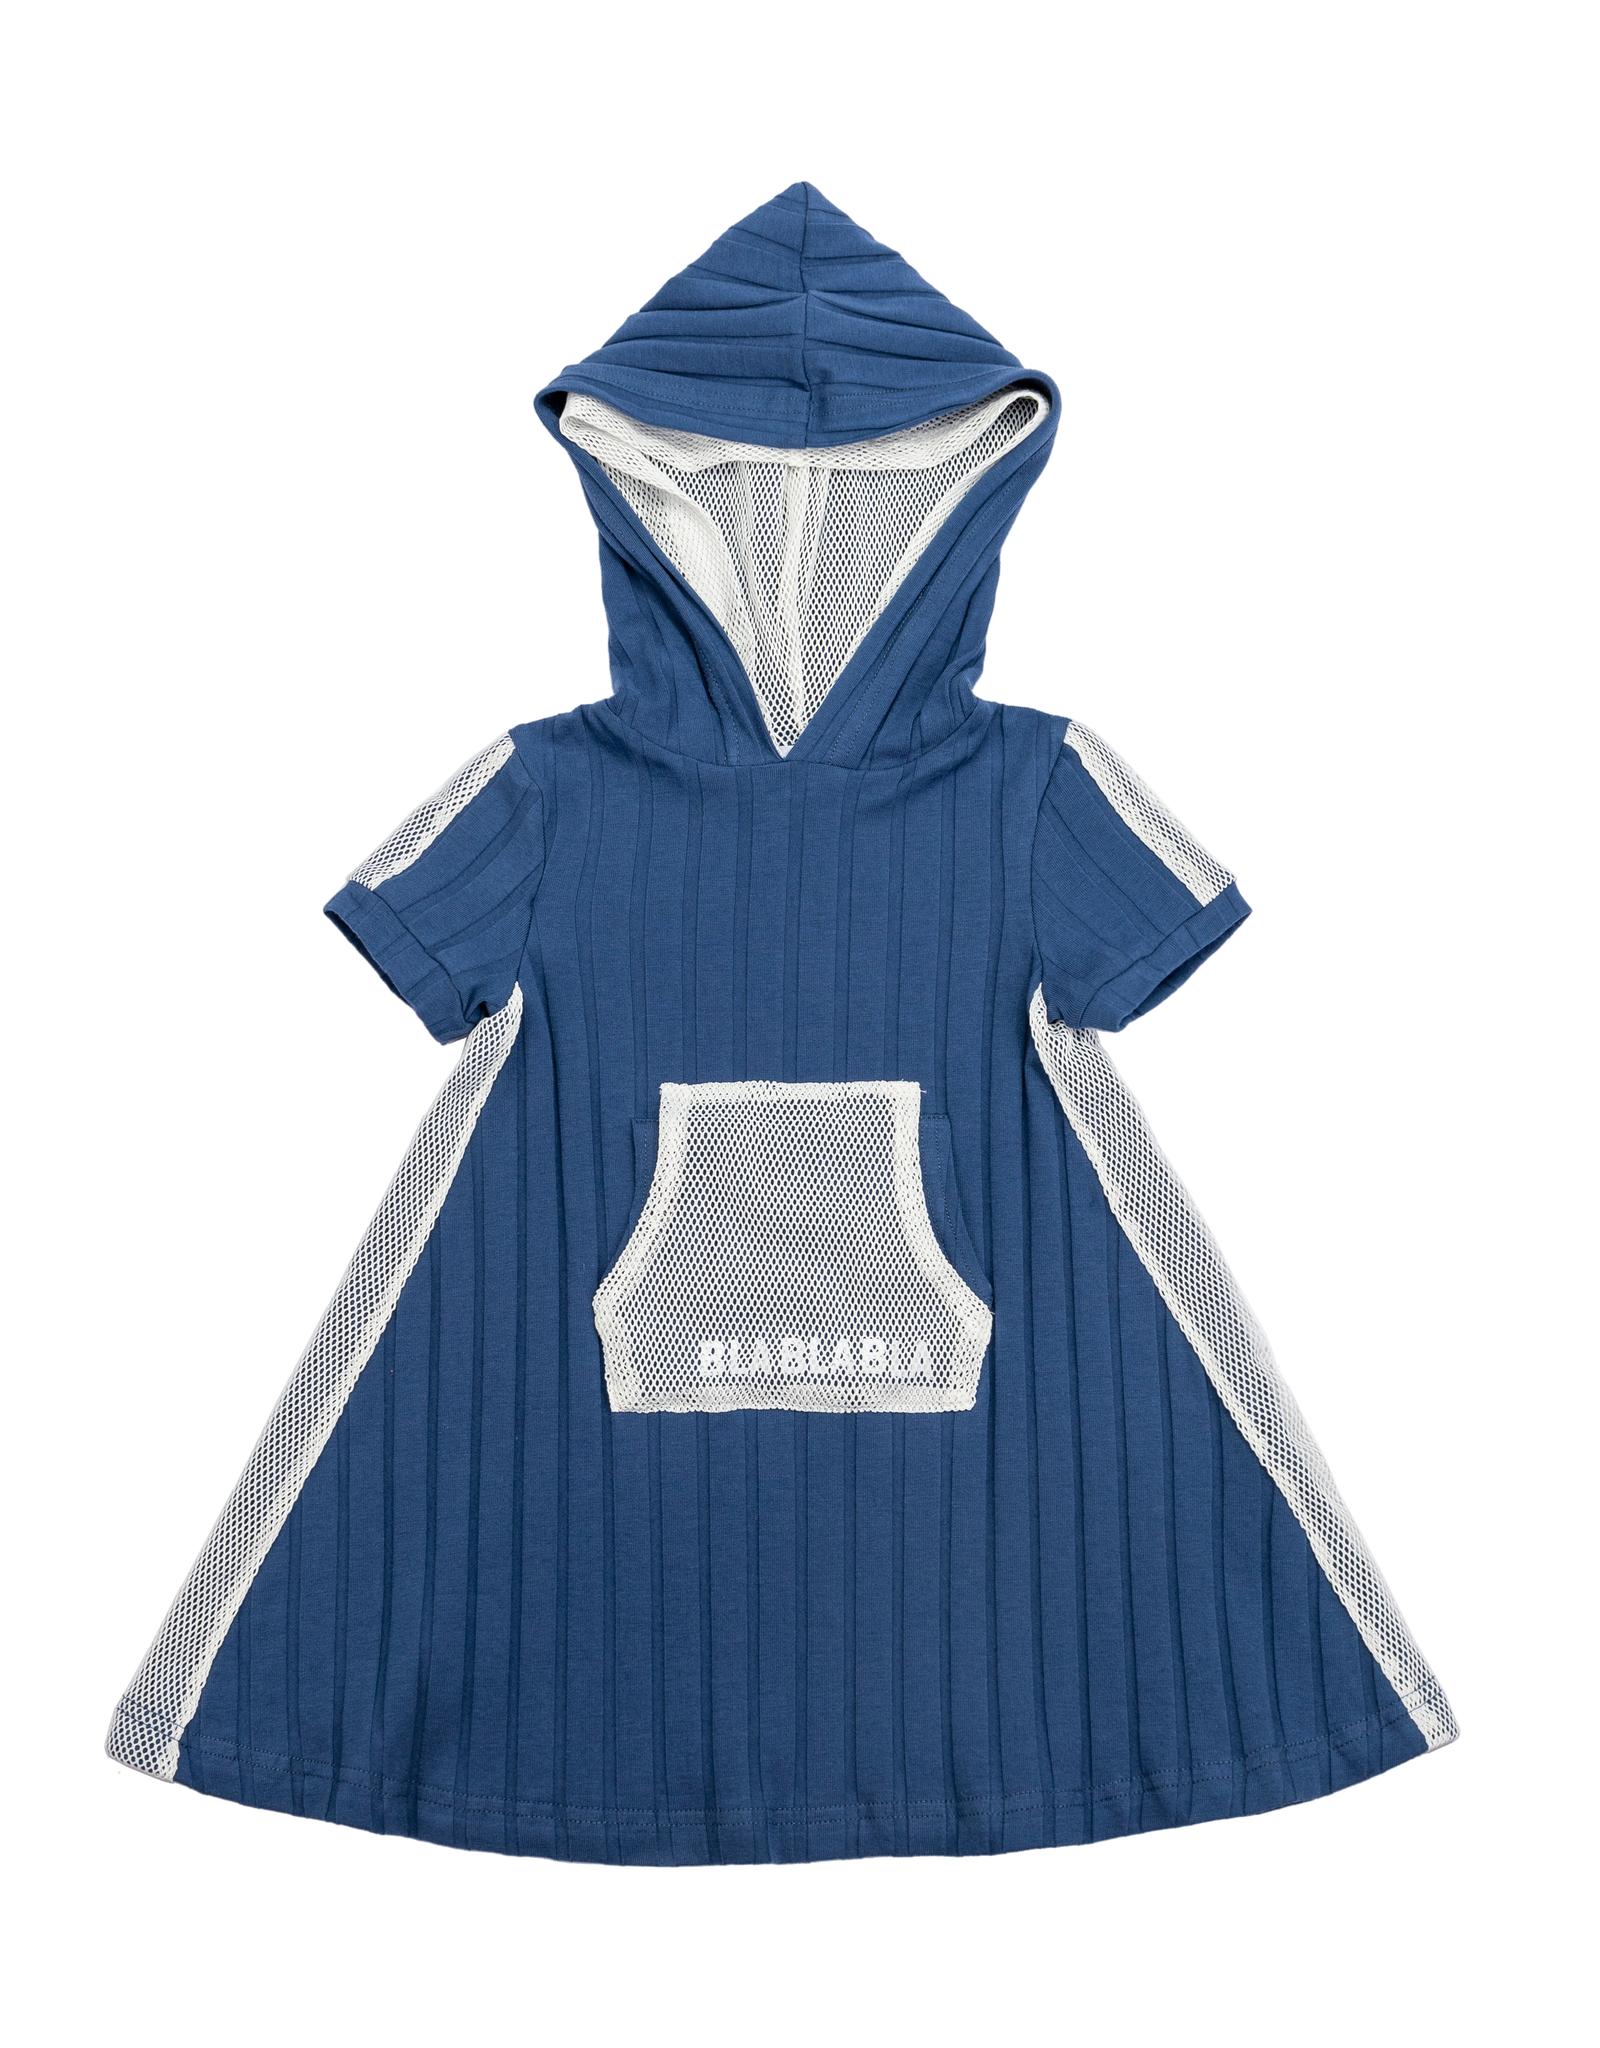 Pronto Pronto Ribbed Dress with Net Kangaroo Pocket and Hood